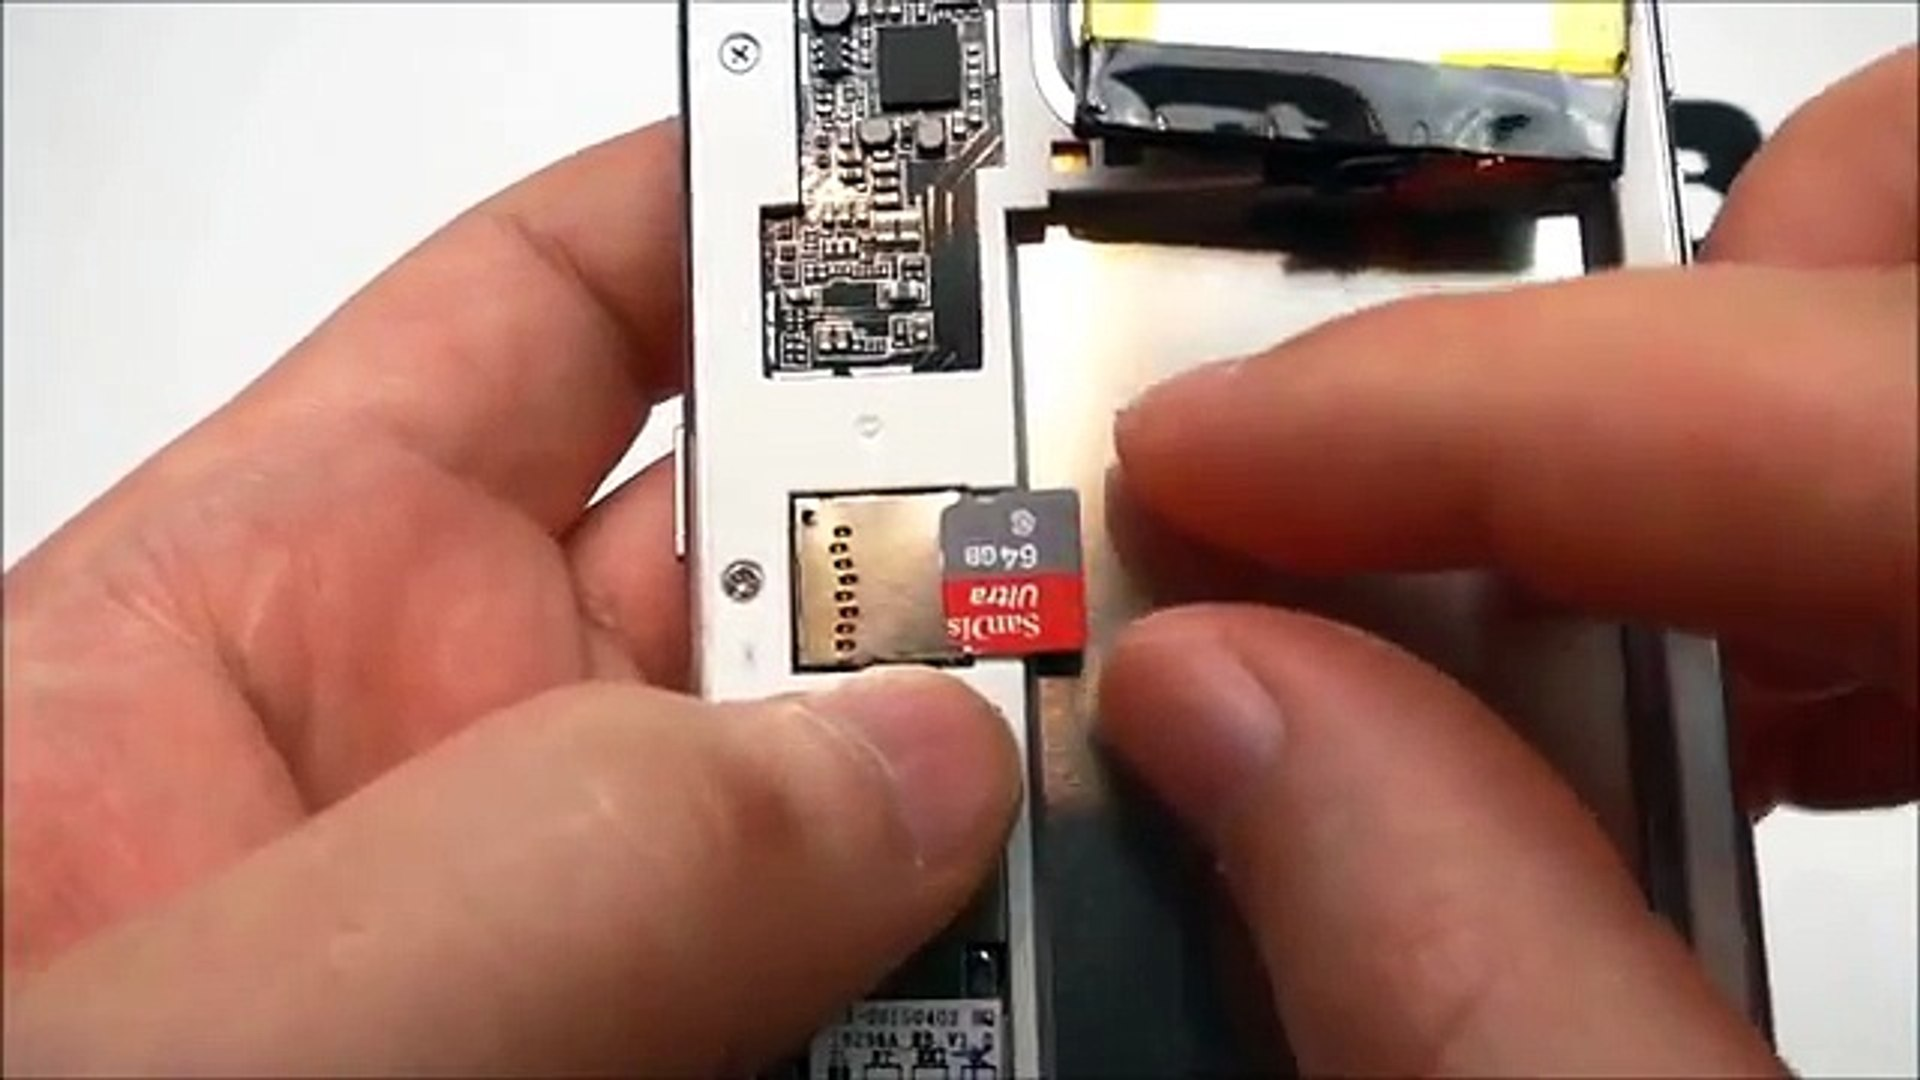 How to insert SD Card in the HDC Galaxy S6, MTK6582, Metalframe, 1:1 Samsung Galaxy S6 Replica